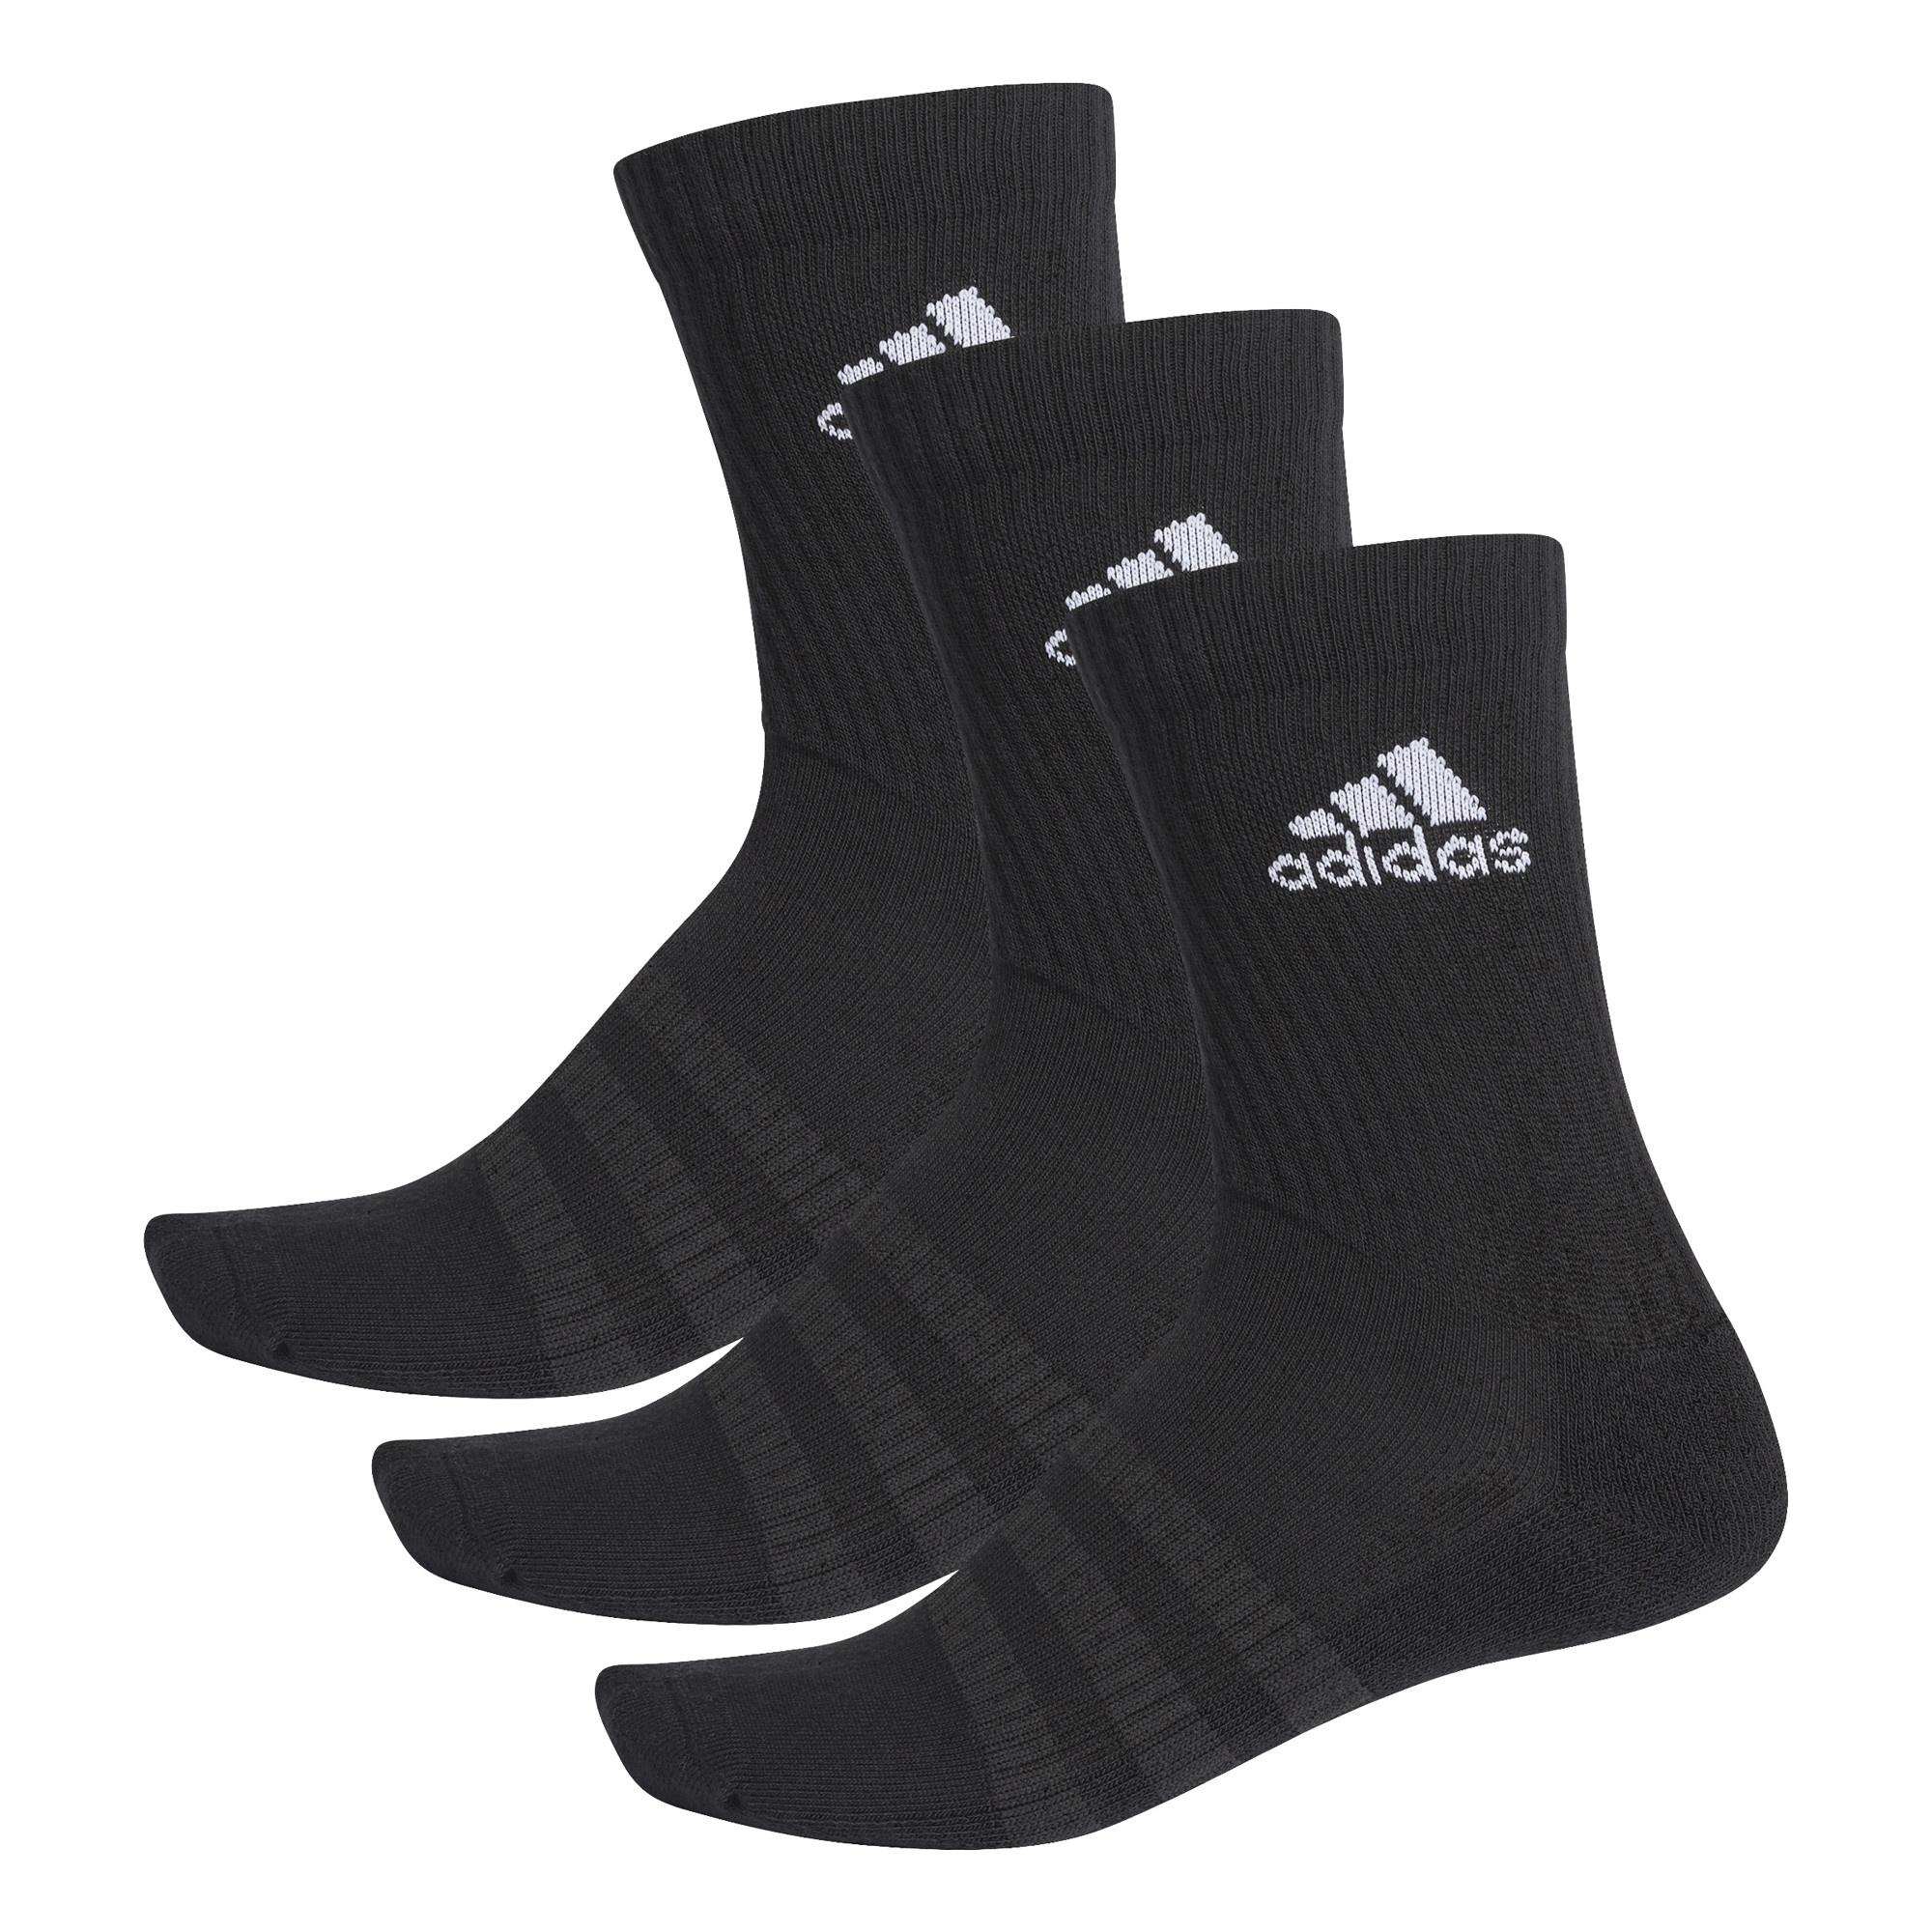 Adidas ADIDAS Crew Sock 3-pack